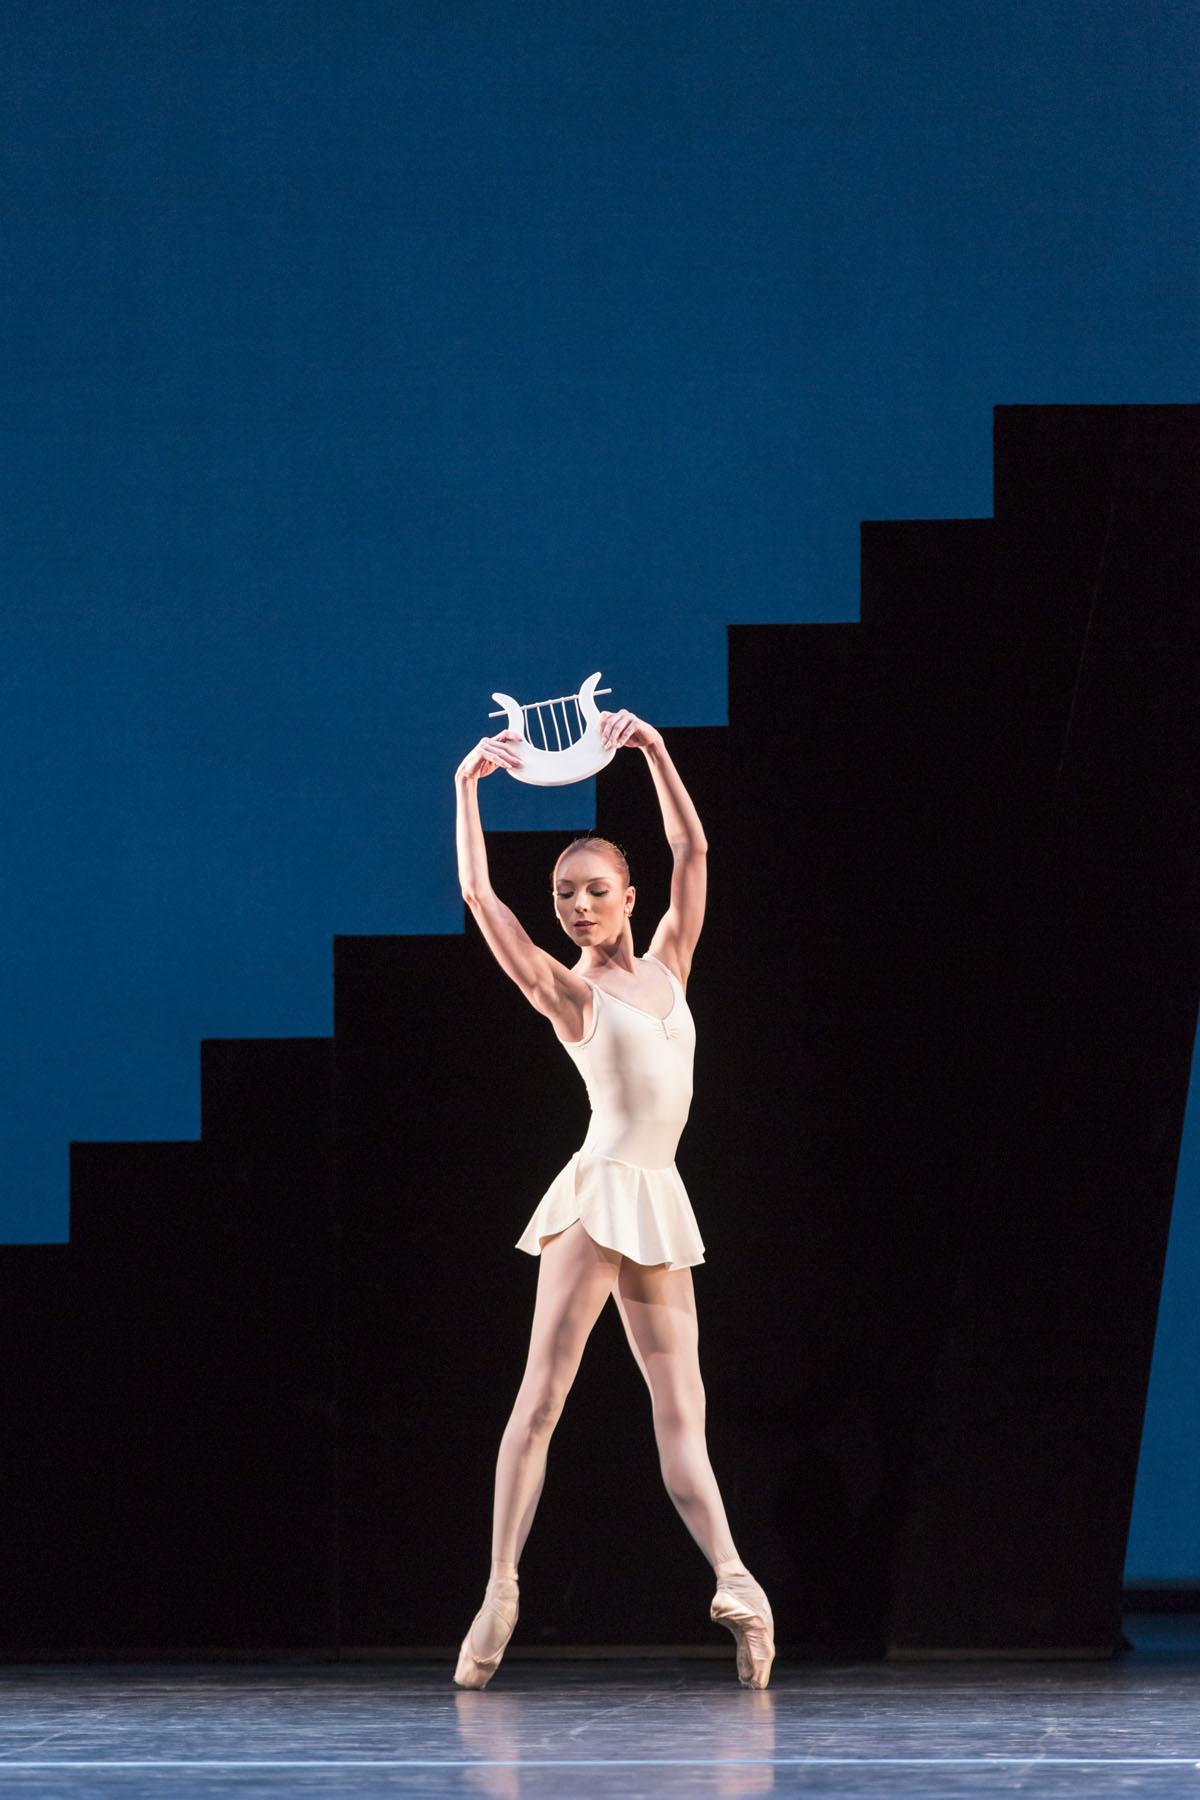 APOLLO ; Music by Stravinsky ; Choreography by Balanchine ; Sarah Lamb ; The Royal Ballet ; At the Royal Opera House, London, UK ; 22 February 2013 ; Credit: Johan Persson / Royal Opera House / ArenaPAL ;